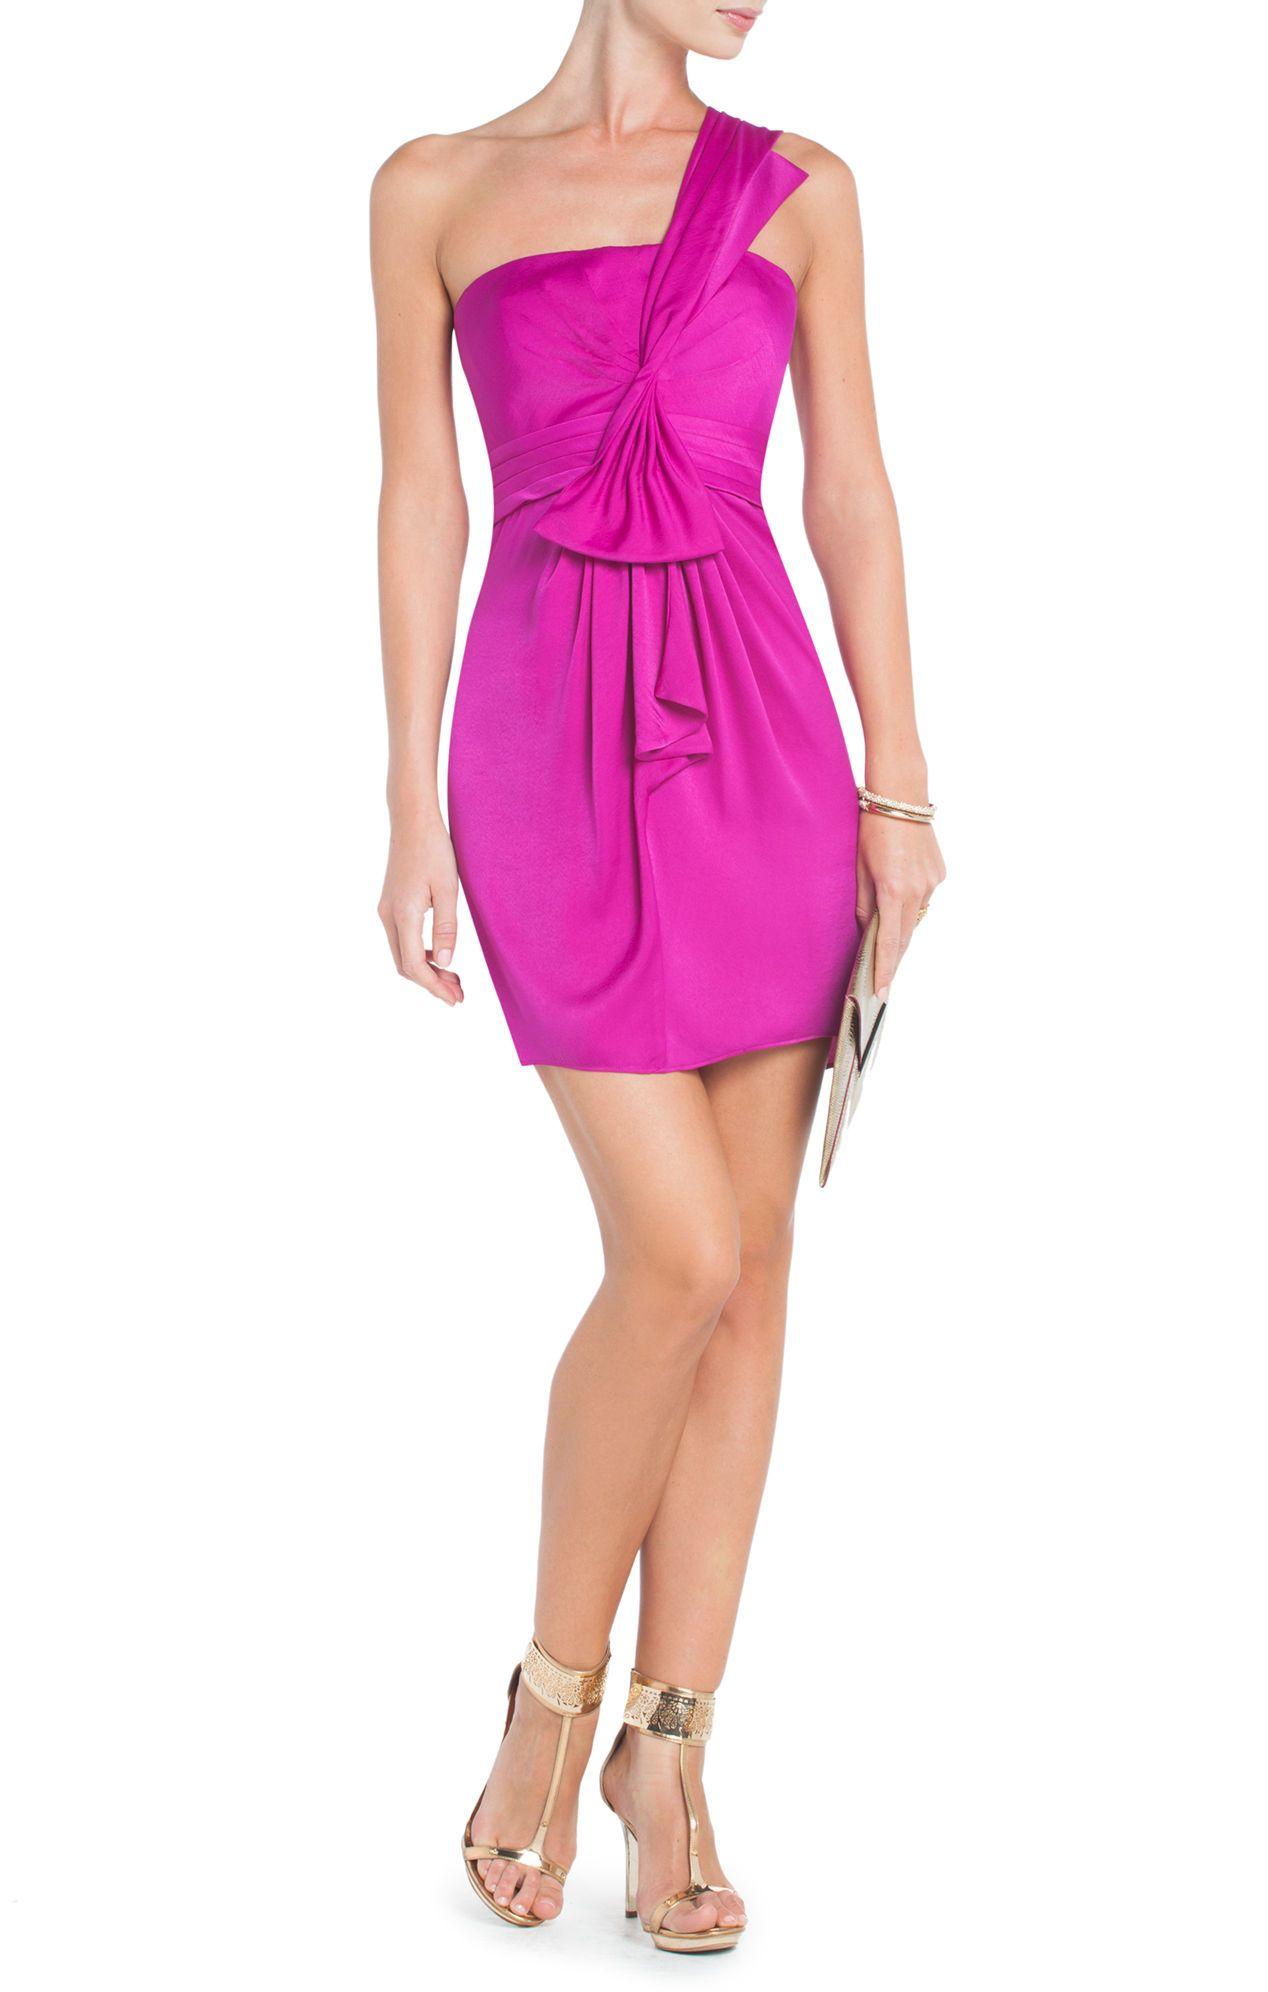 Palais One-Shoulder Cocktail Dress   BCBG   Vestidos   Pinterest ...